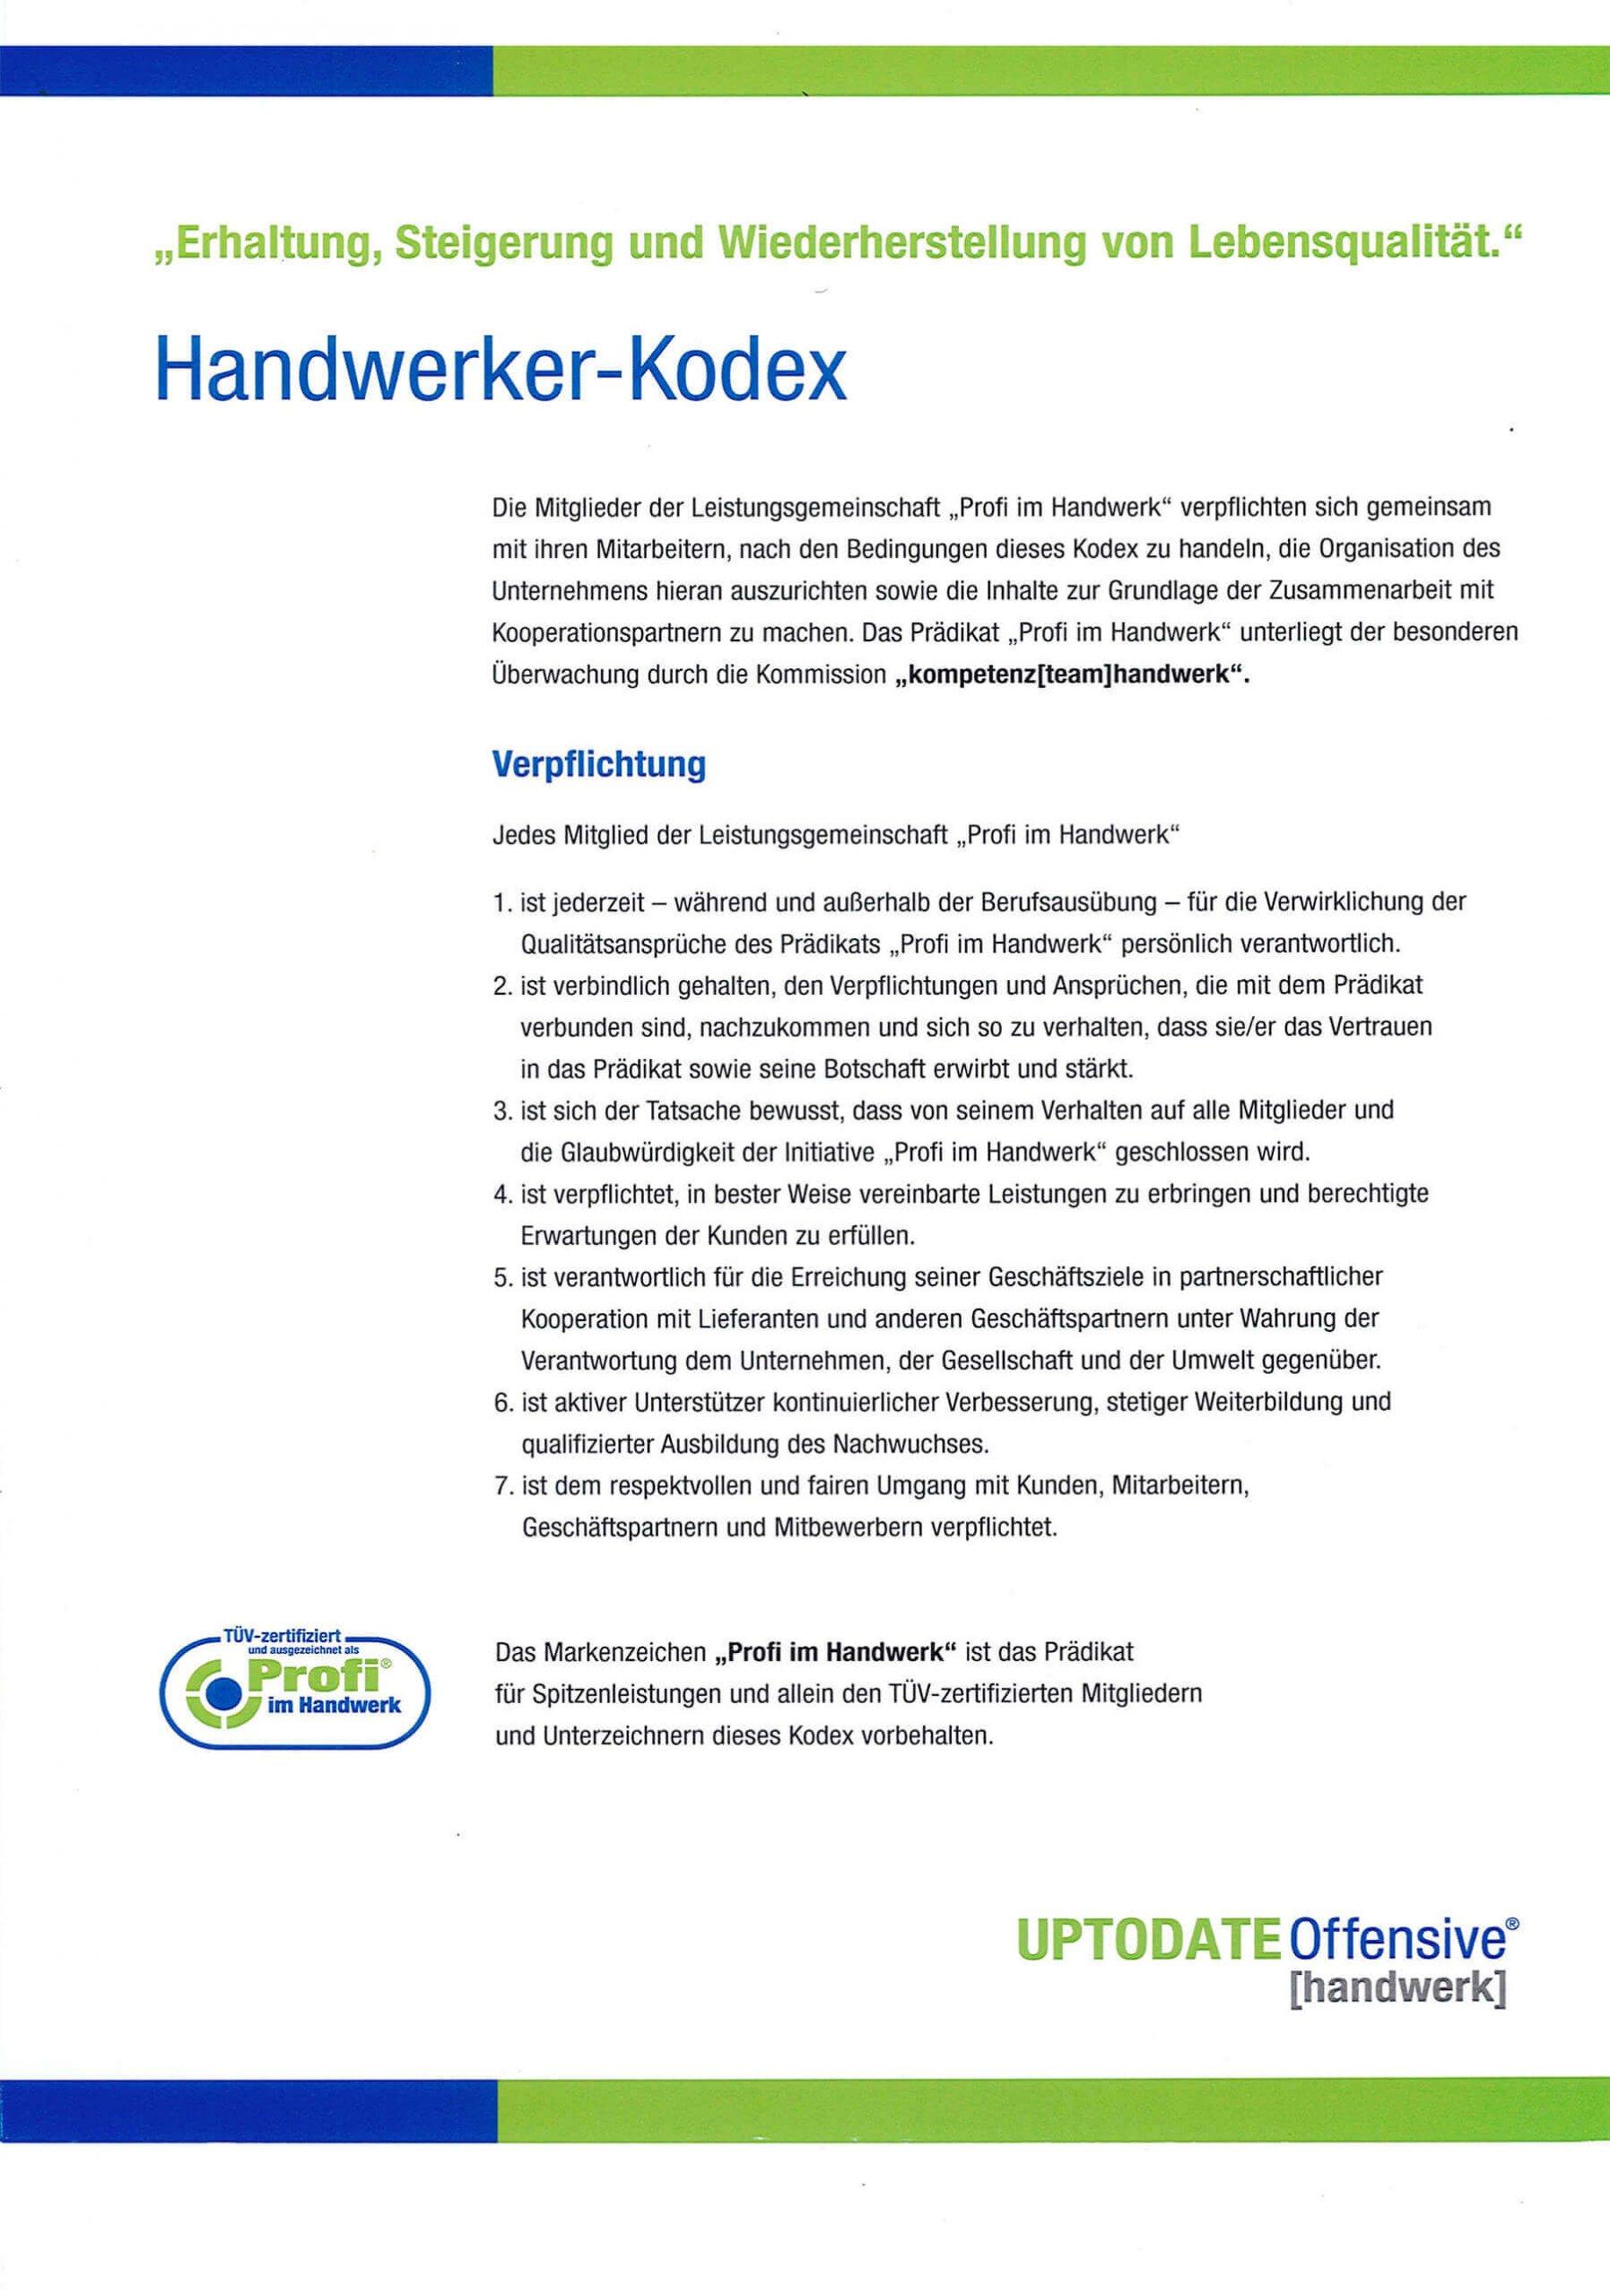 Handwerk Kodex - Eurotec